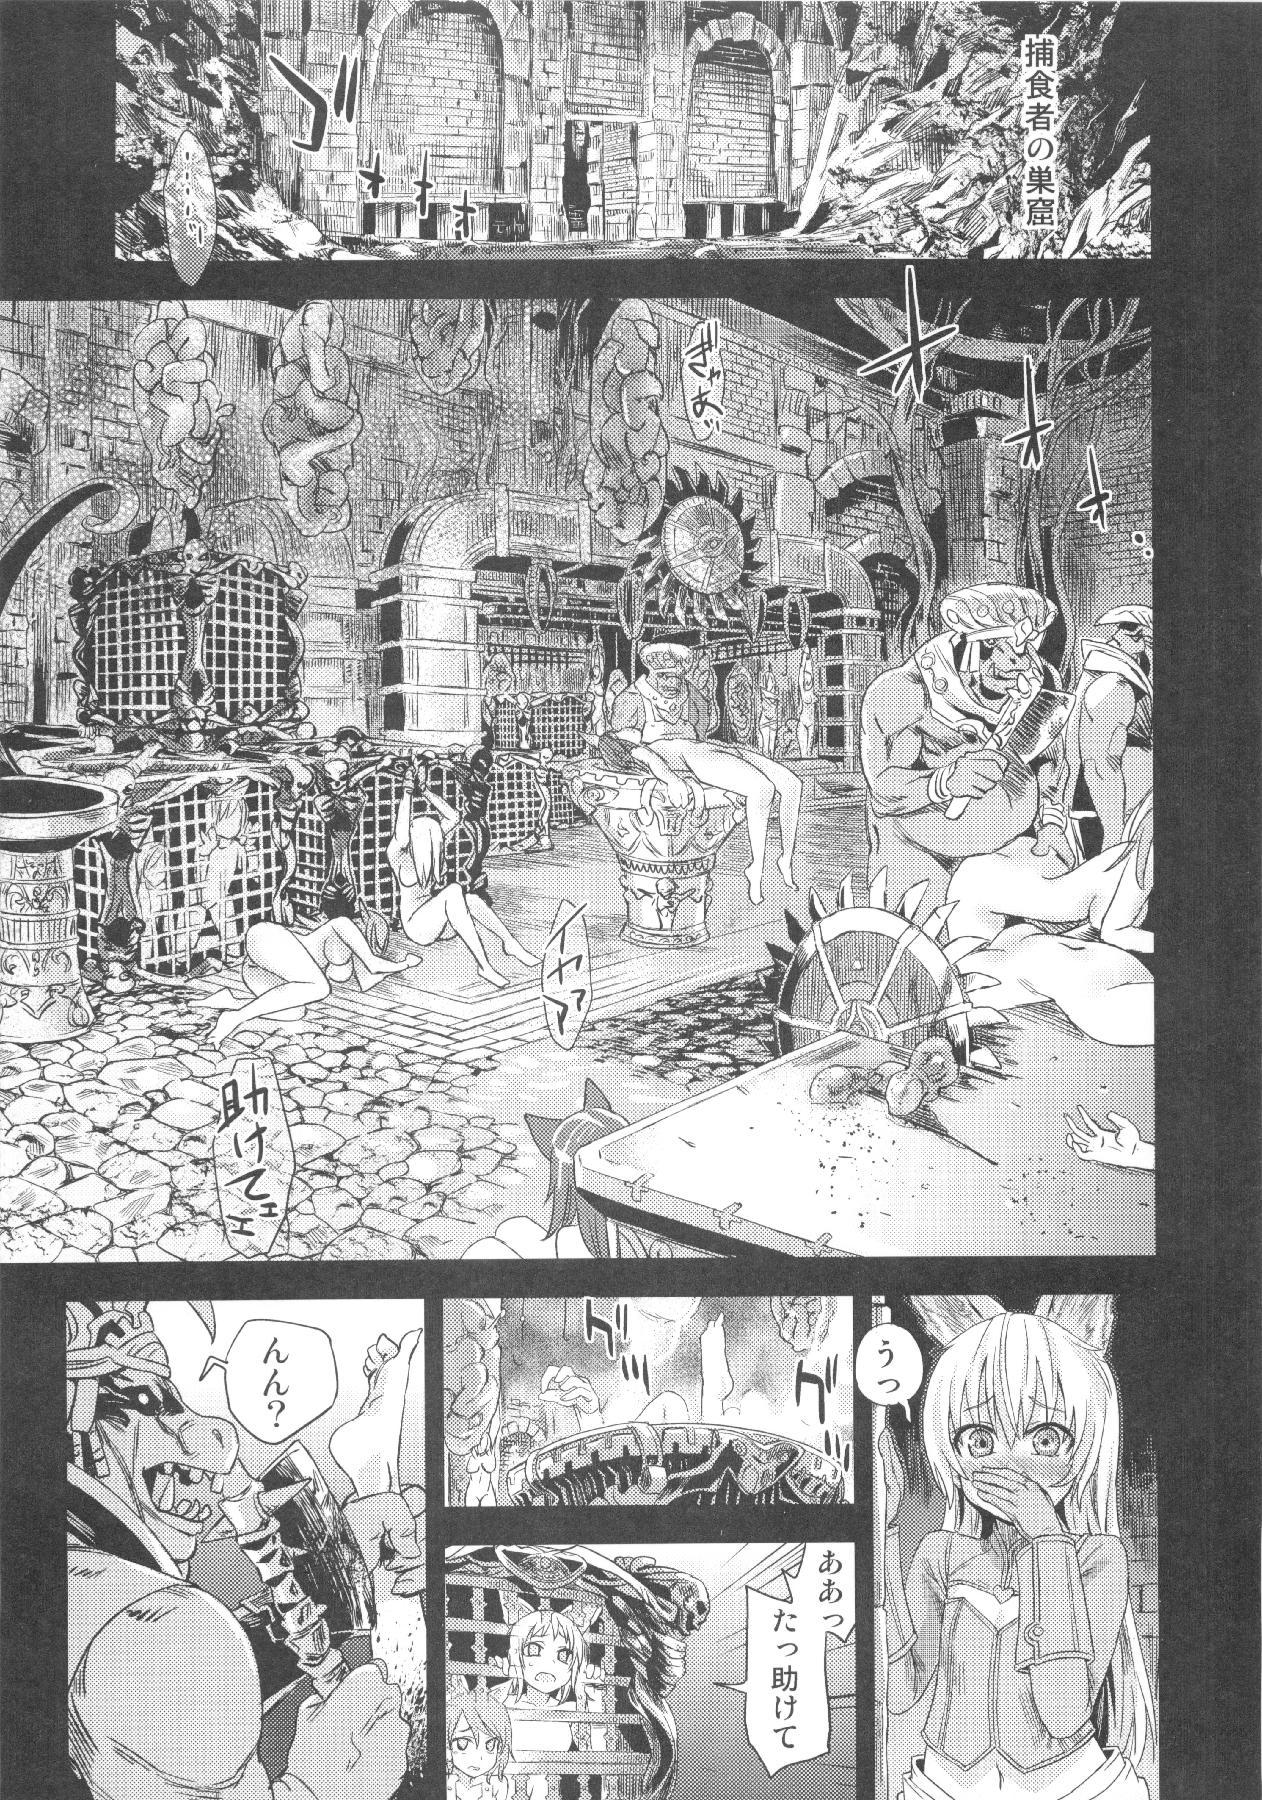 (C83) [Fatalpulse (Asanagi)] VictimGirls Compiled Vol.1 -Victimgirls Soushuuhen 1- MMO Game Selection (Various) 159